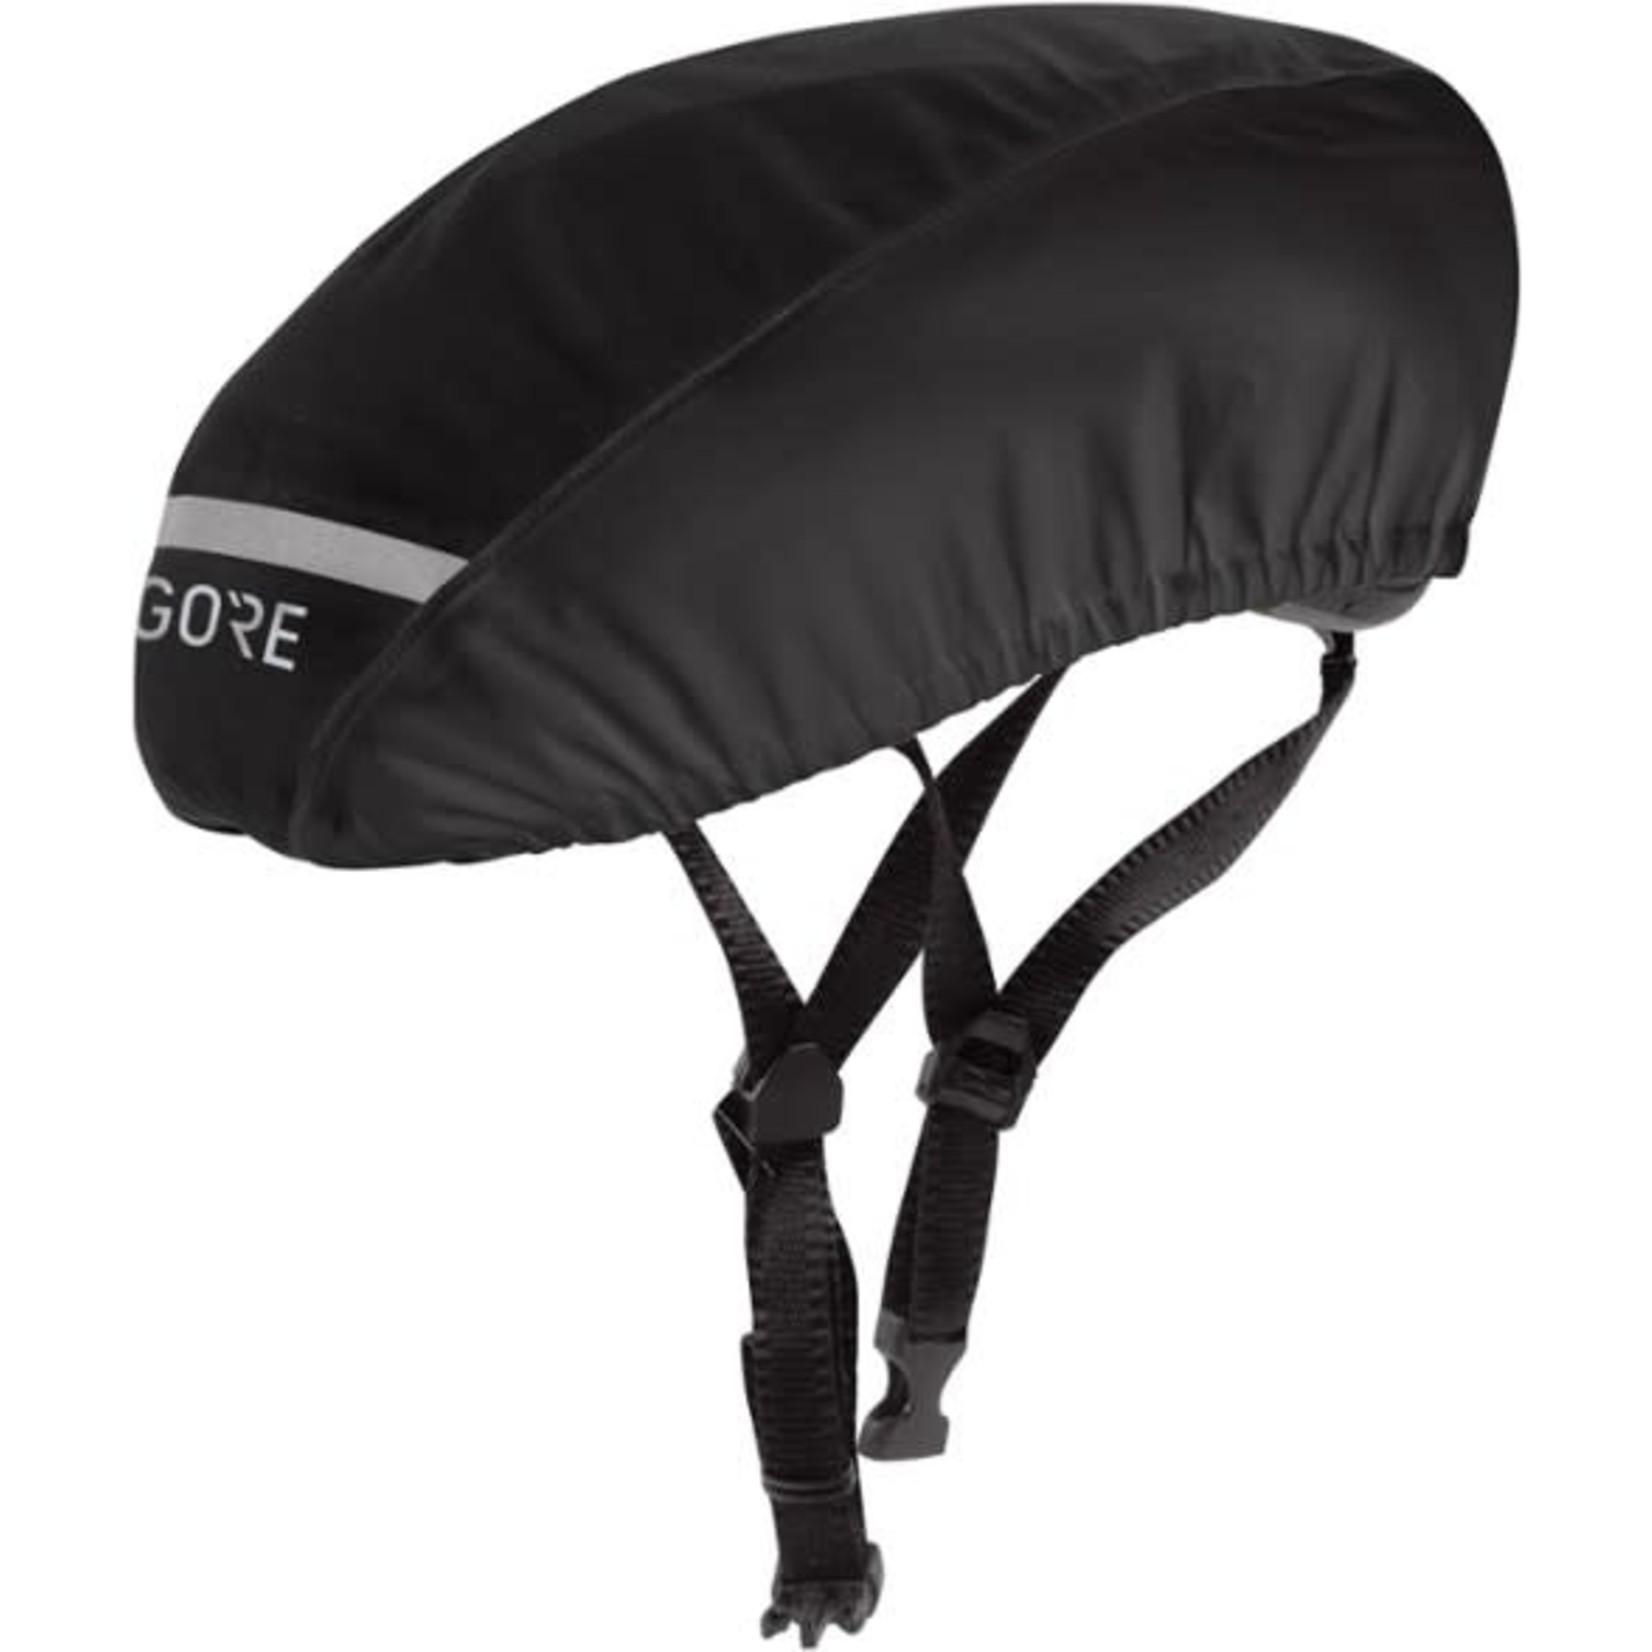 GORE Wear GORE C3 GORE-Tex Helmet Cover, BLK LG